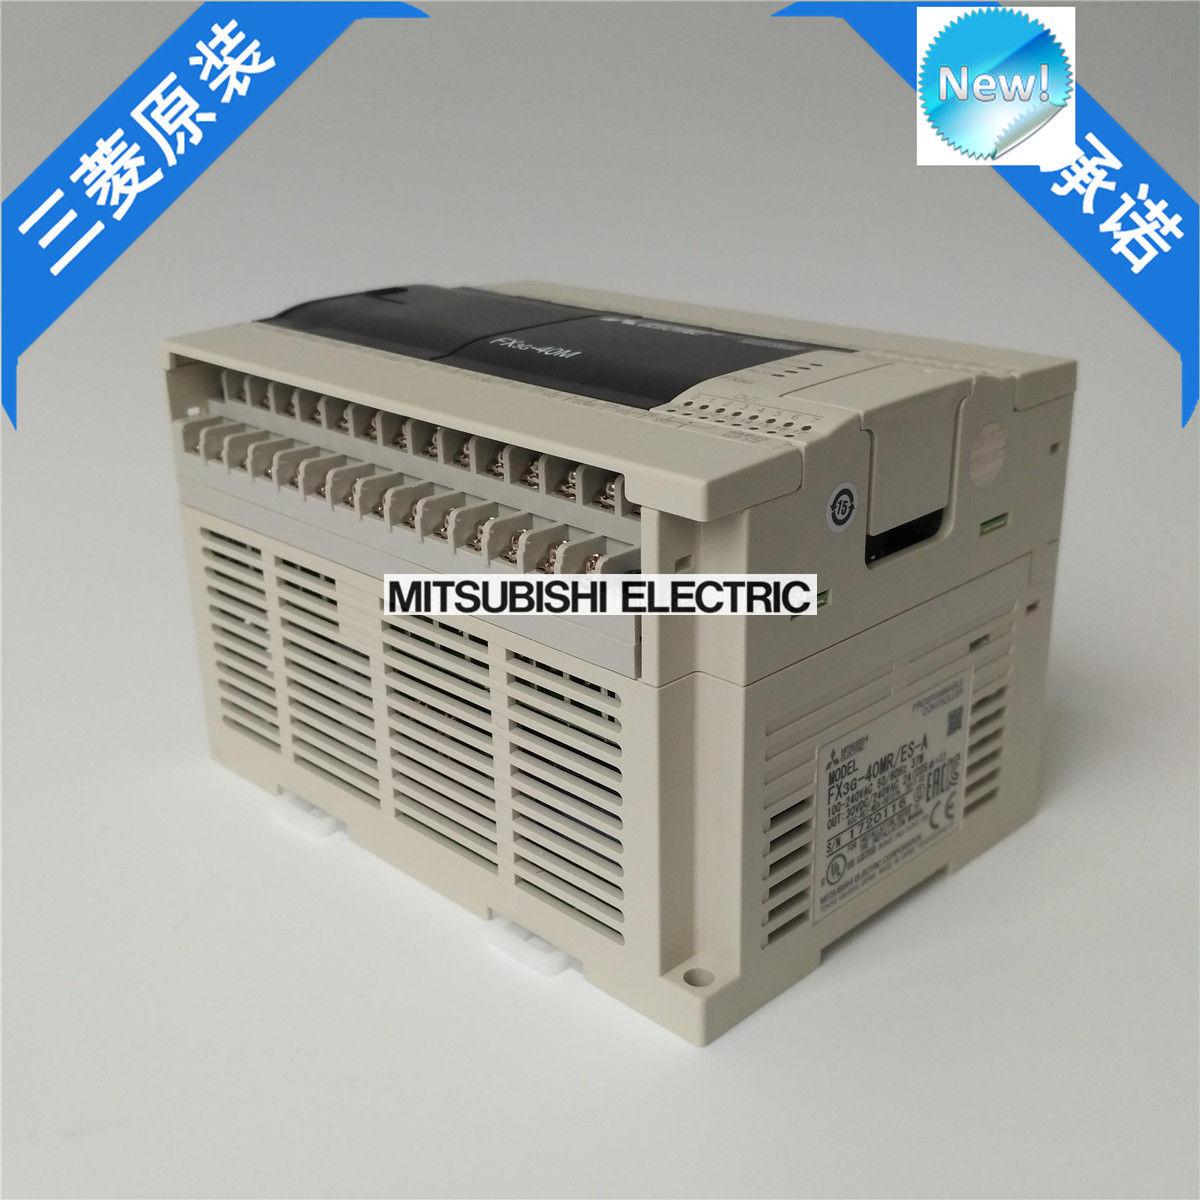 Mitsubishi Electric Corporation FX Series CPU Direct Driver